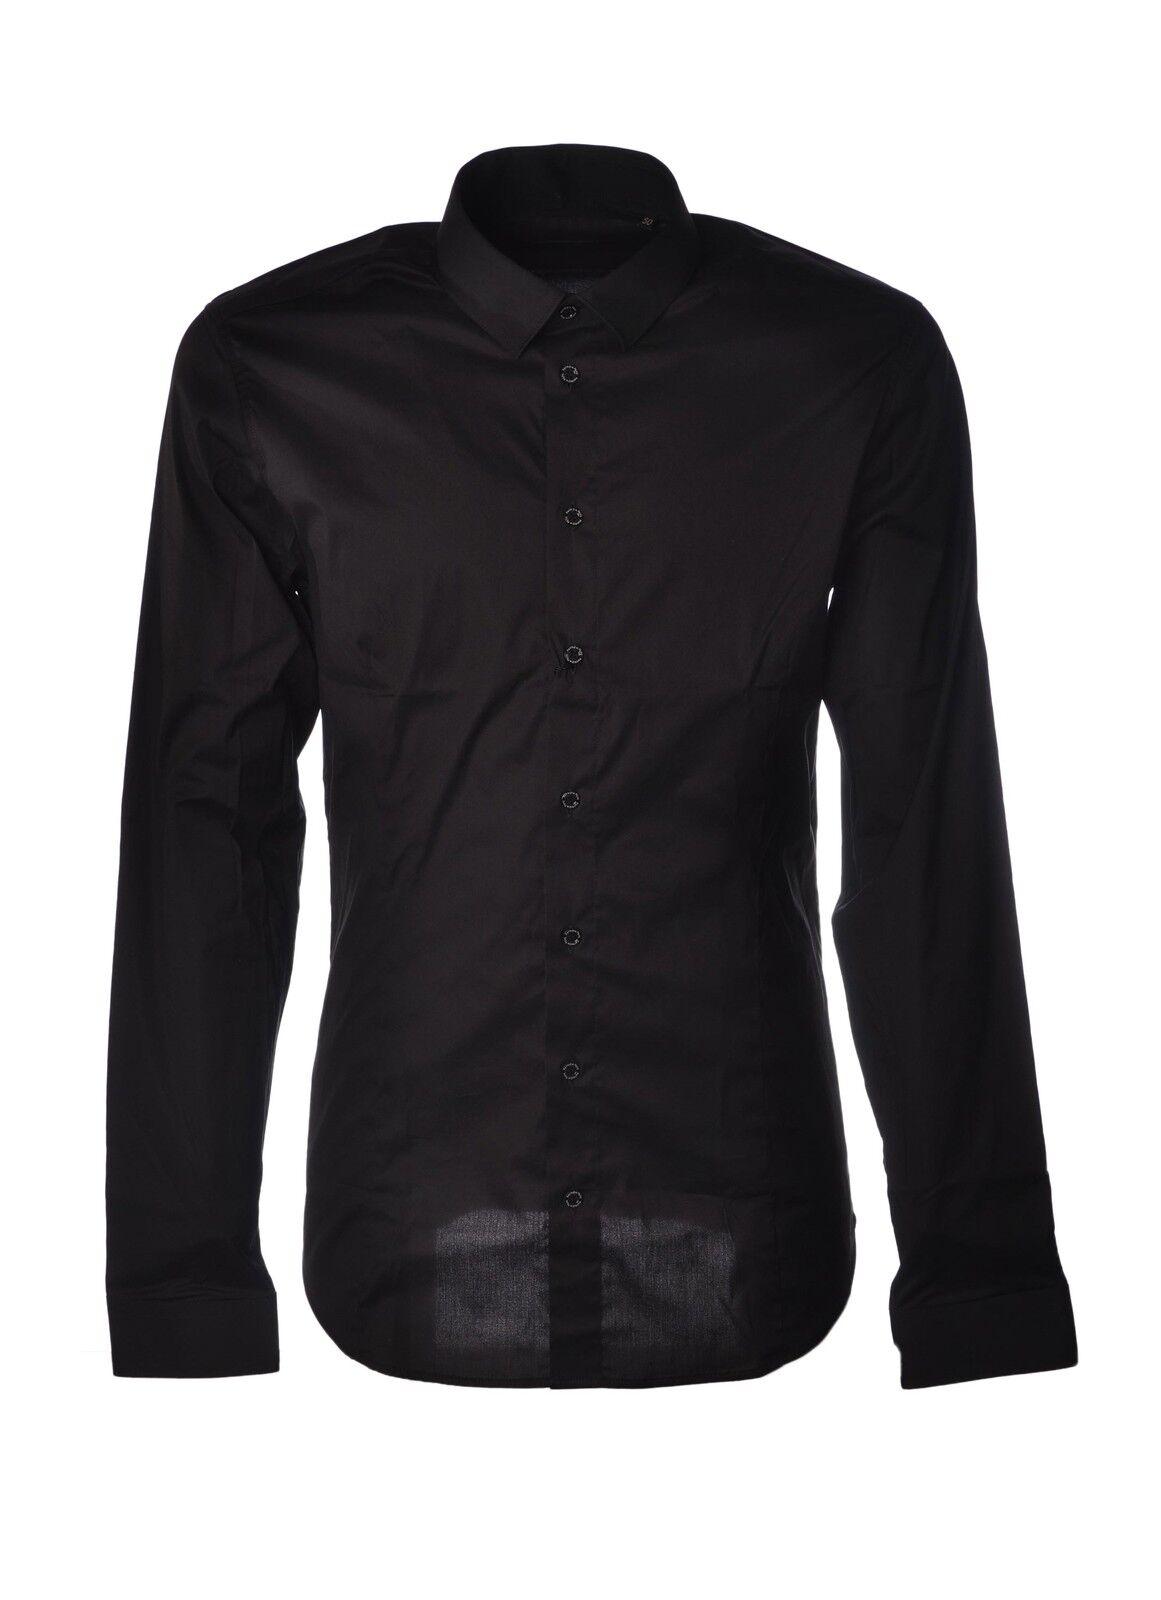 Patrizia Pepe  -  Shirt - Männchen - Schwarz - 3810129A185552